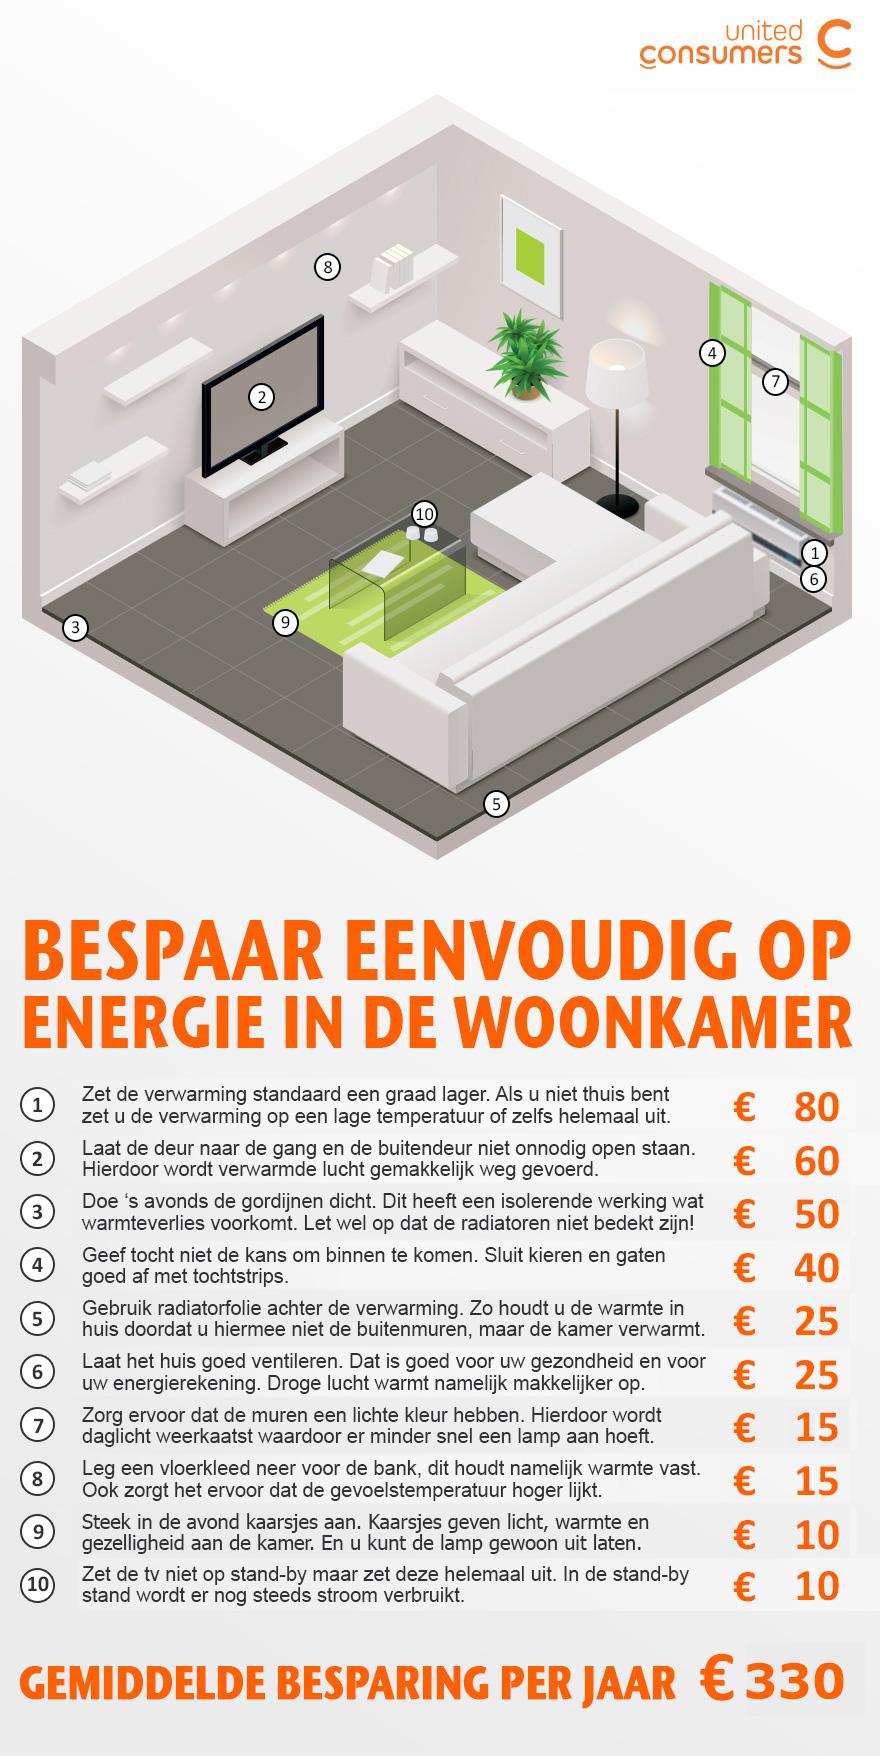 Bespaar eenvoudig energie in de woonkamer